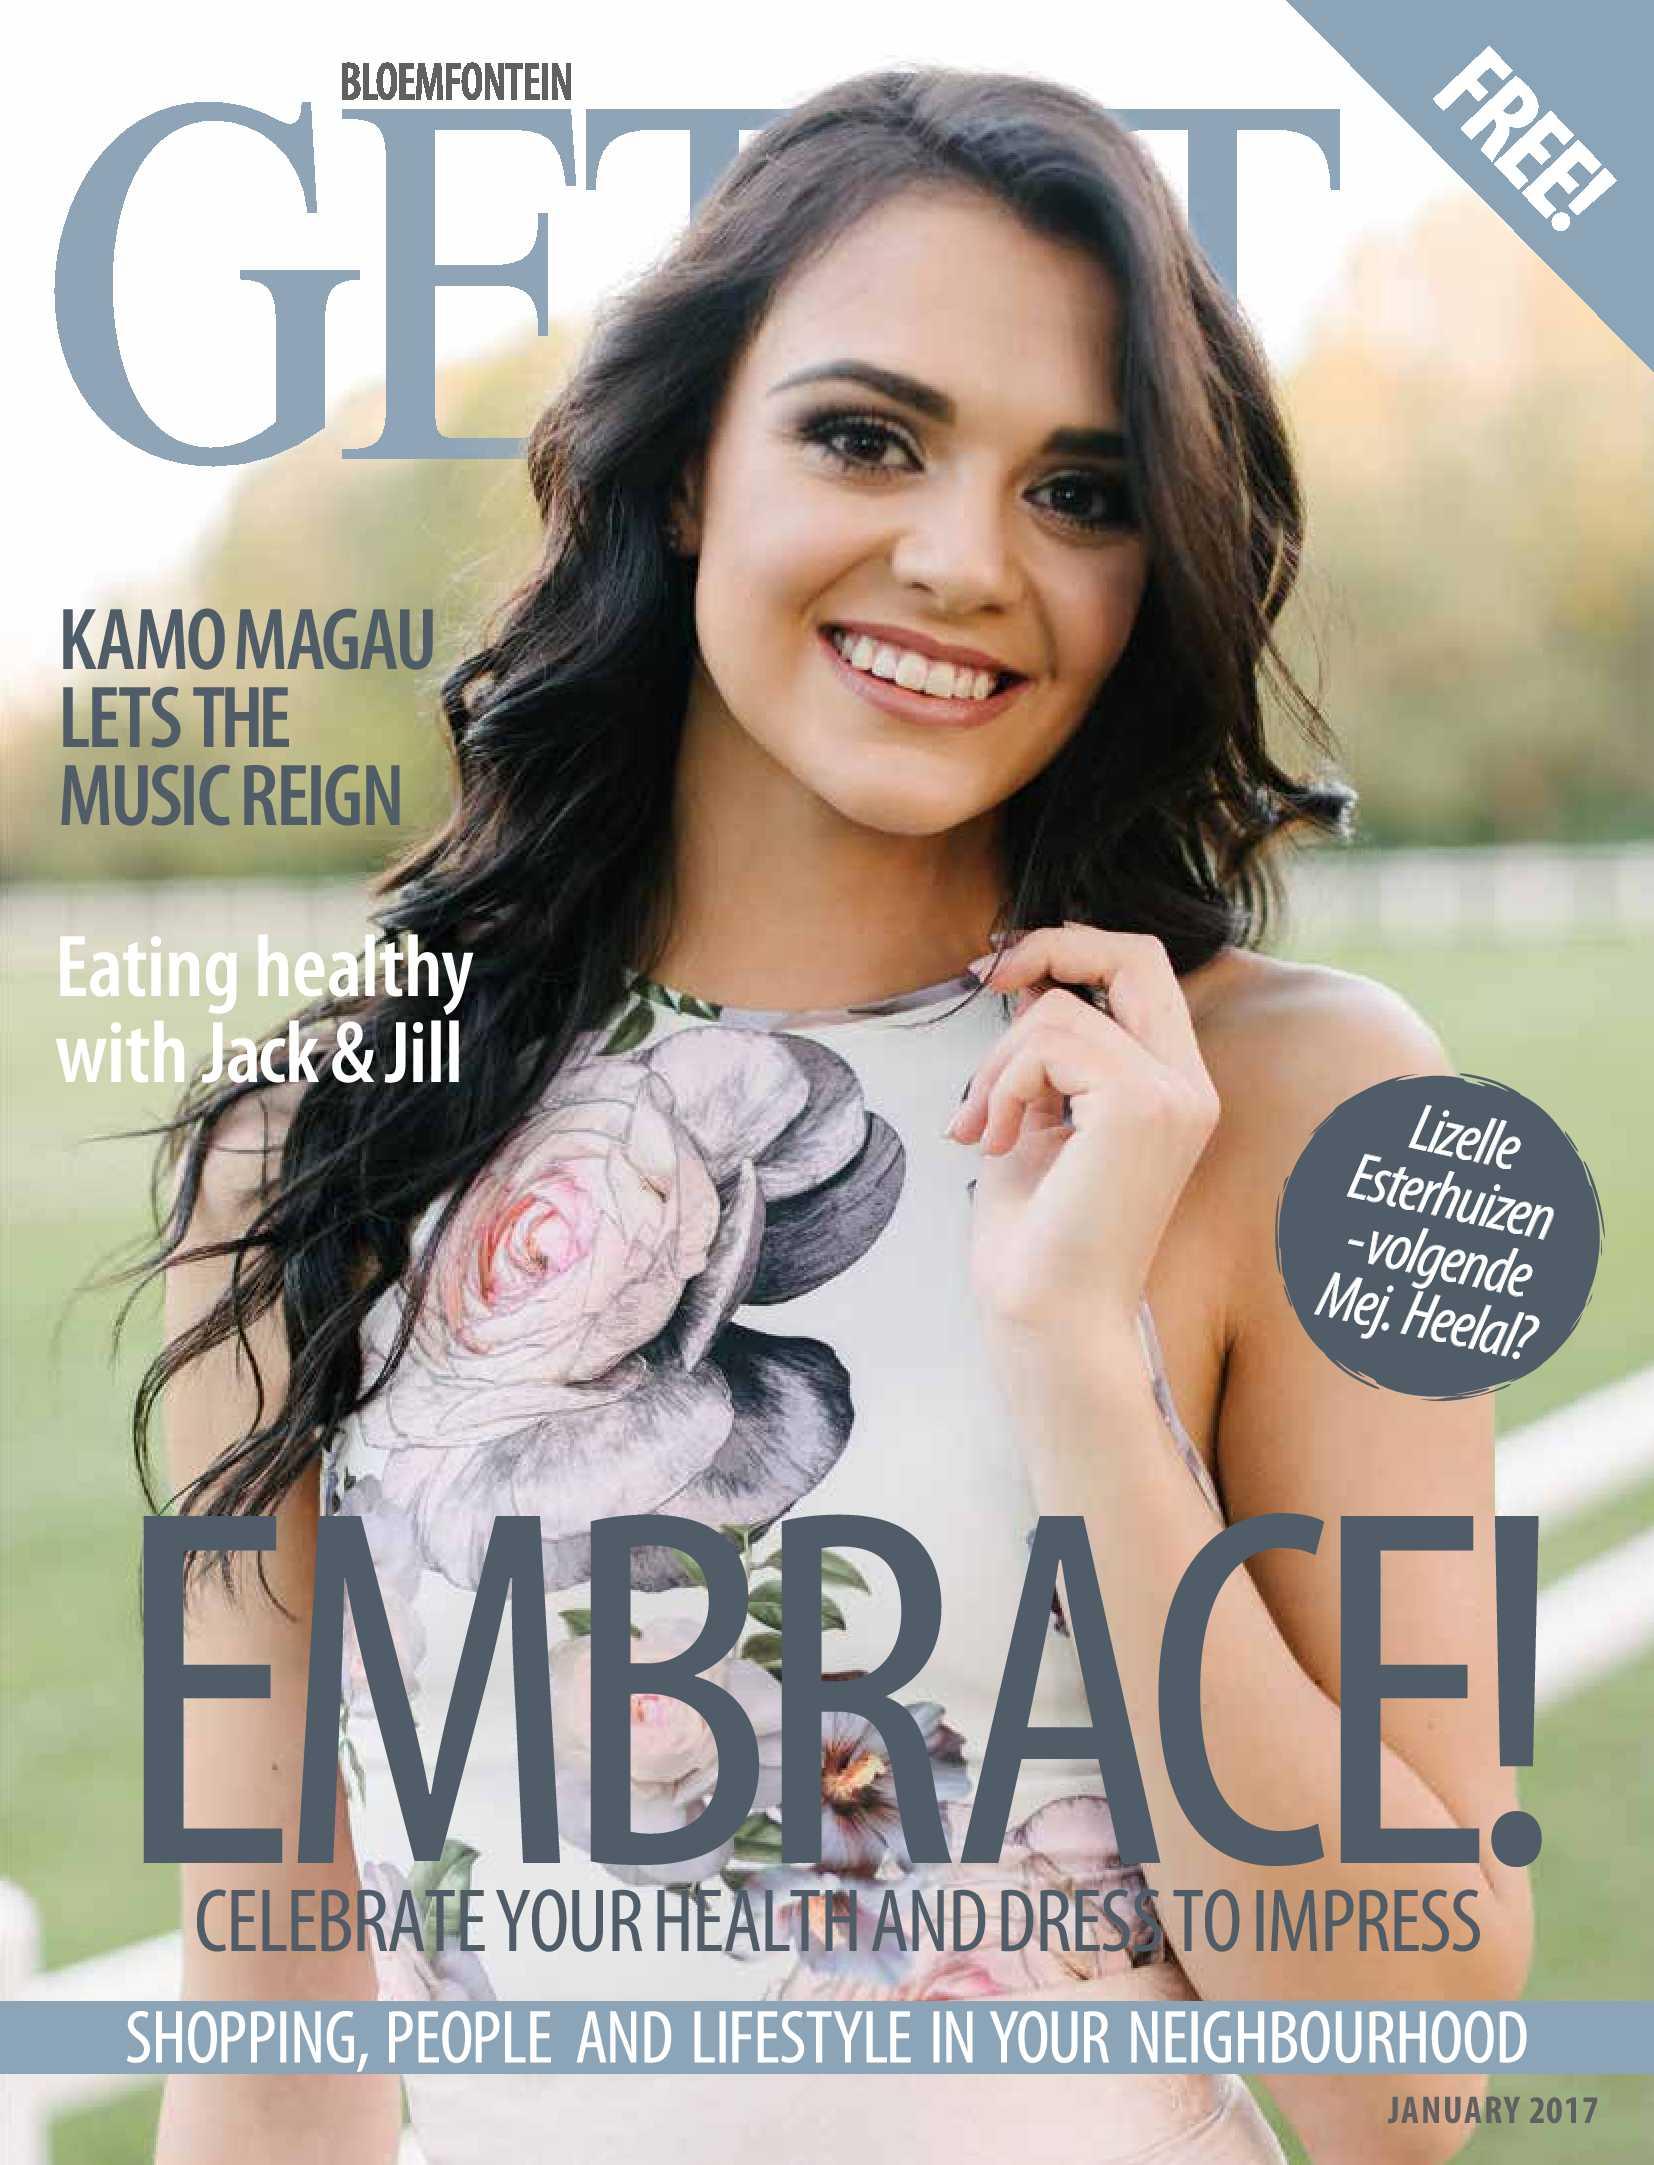 bloemfontein-getit-january-2017-epapers-page-1